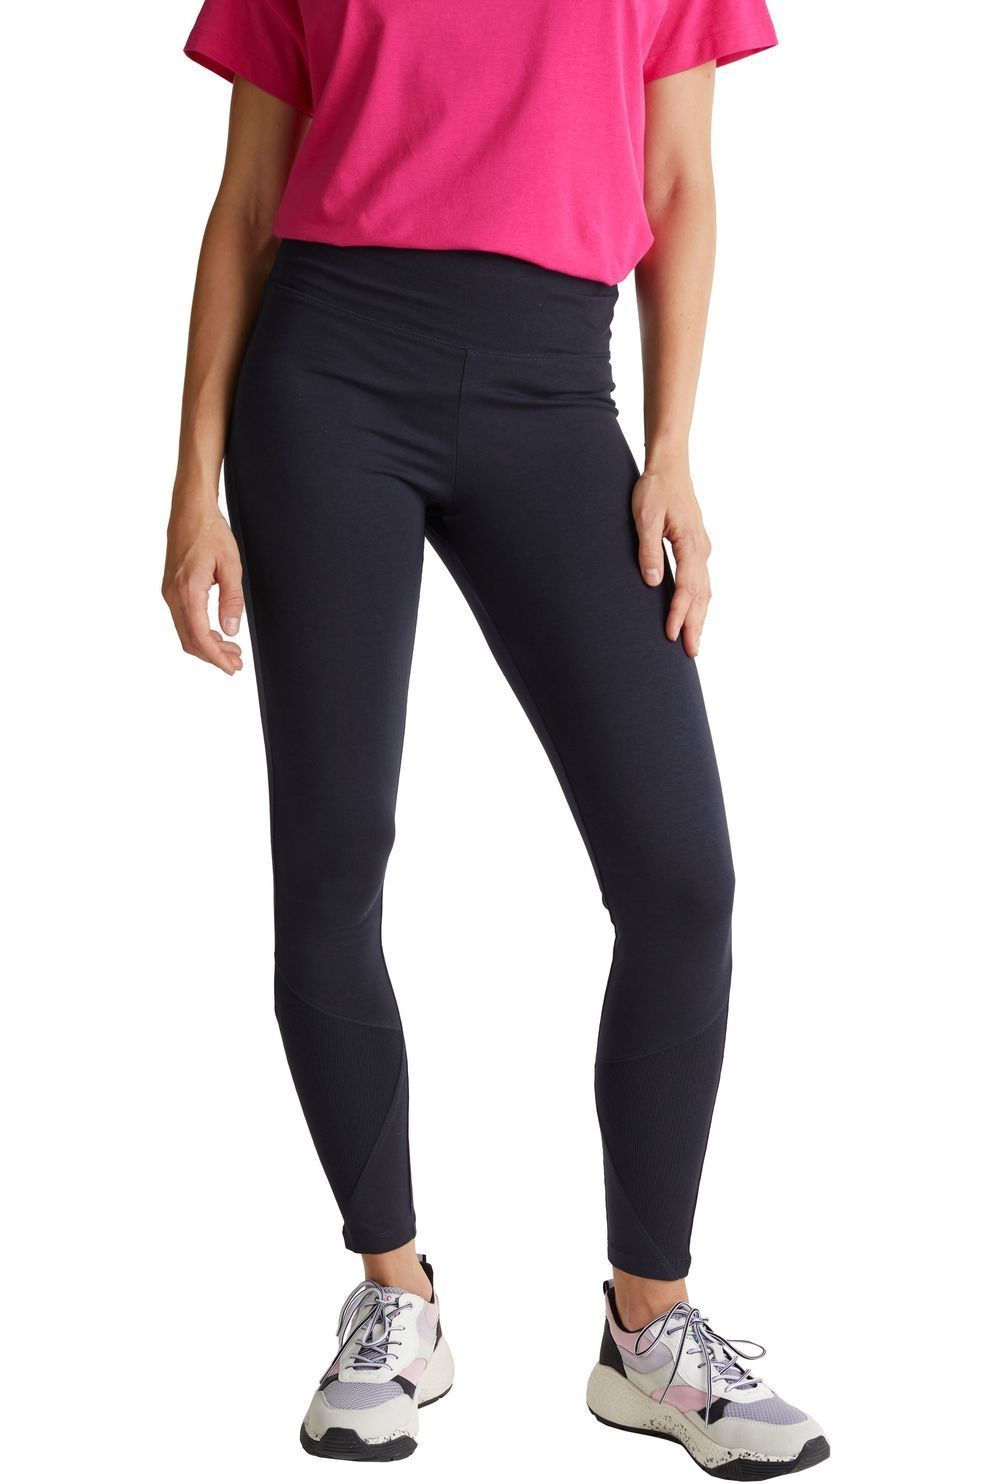 Esprit Legging Tight Cotton Lycra Uni voor dames - Blauw - Maten: XS, S, M - Nieuwe collectie